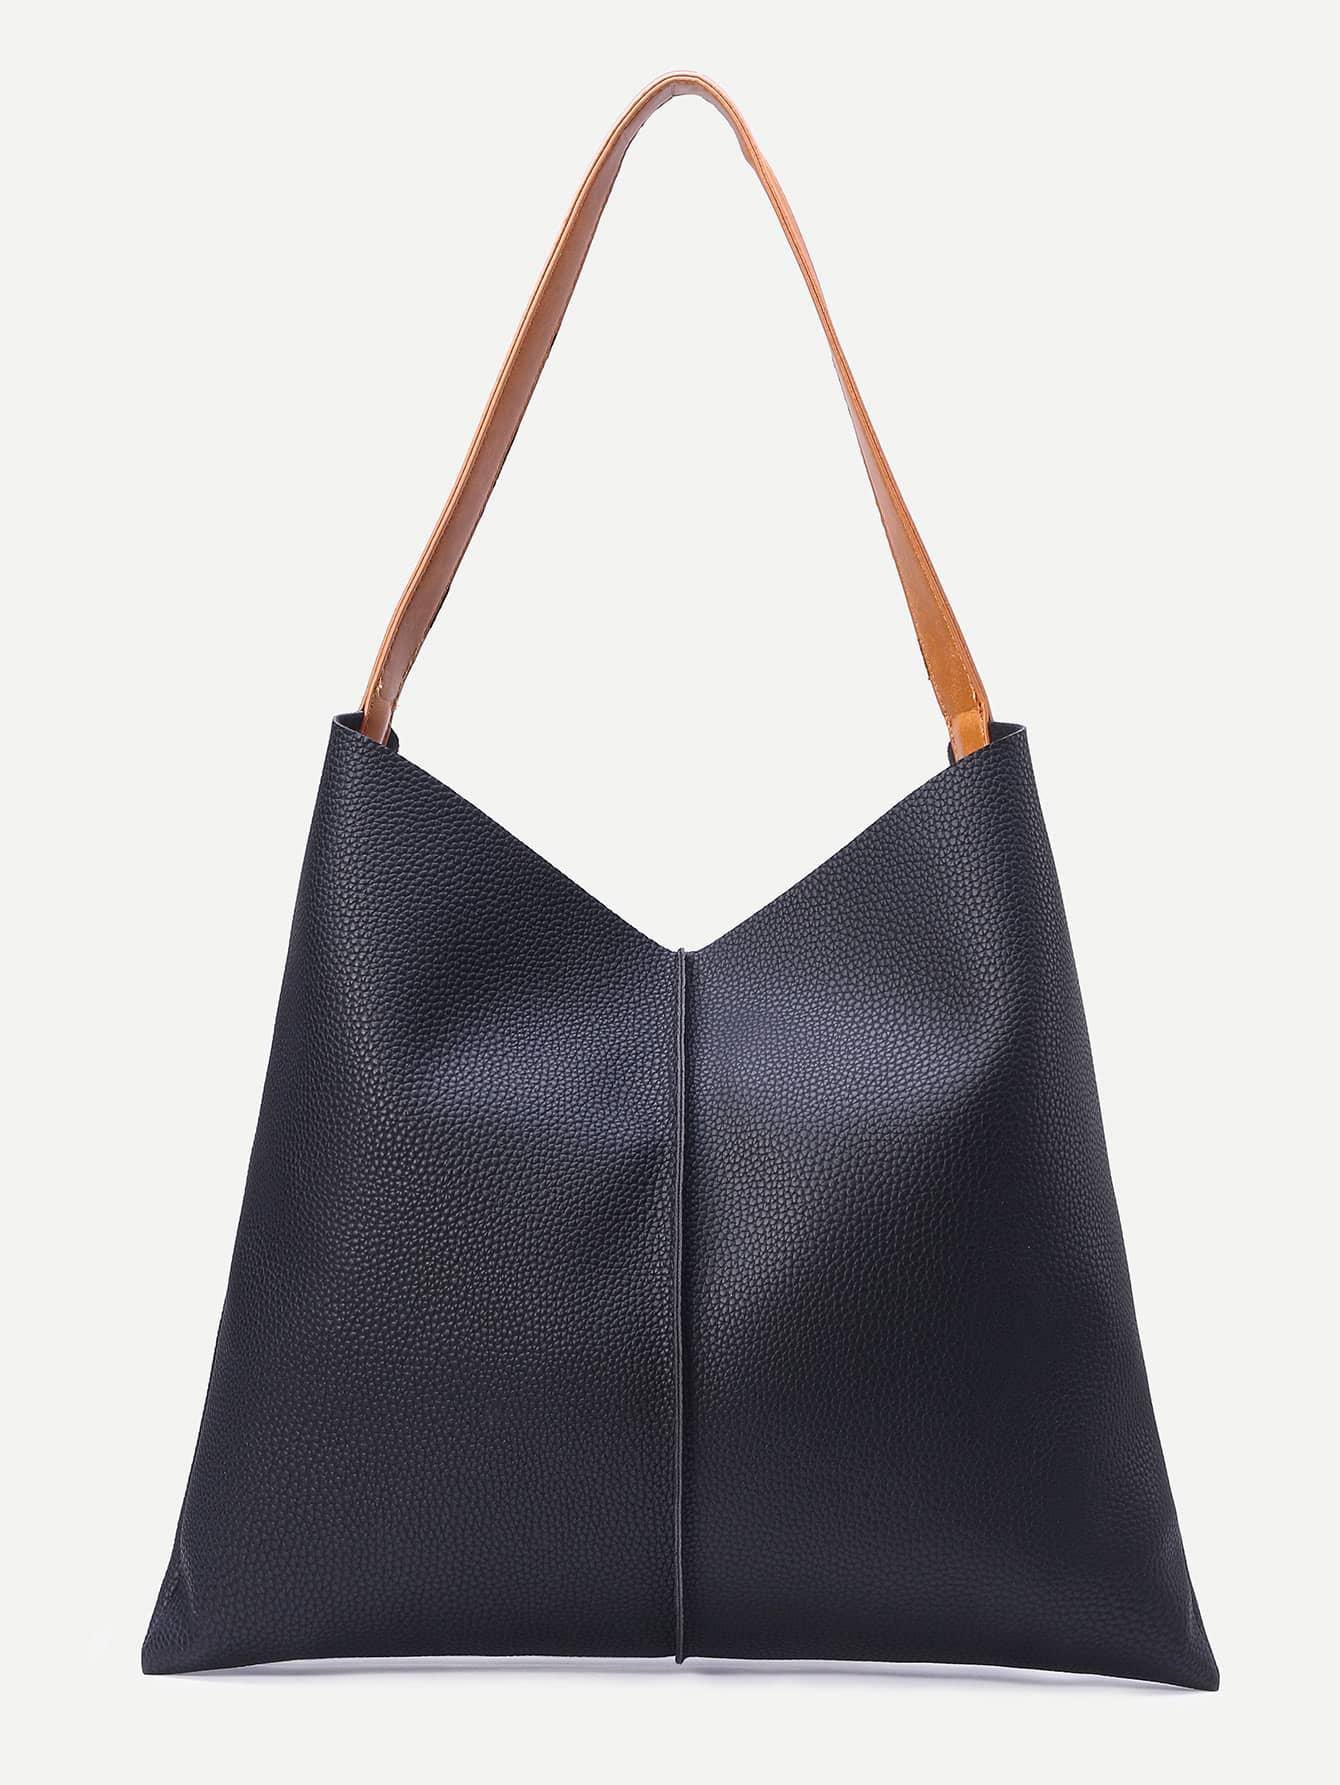 bag160822927_2